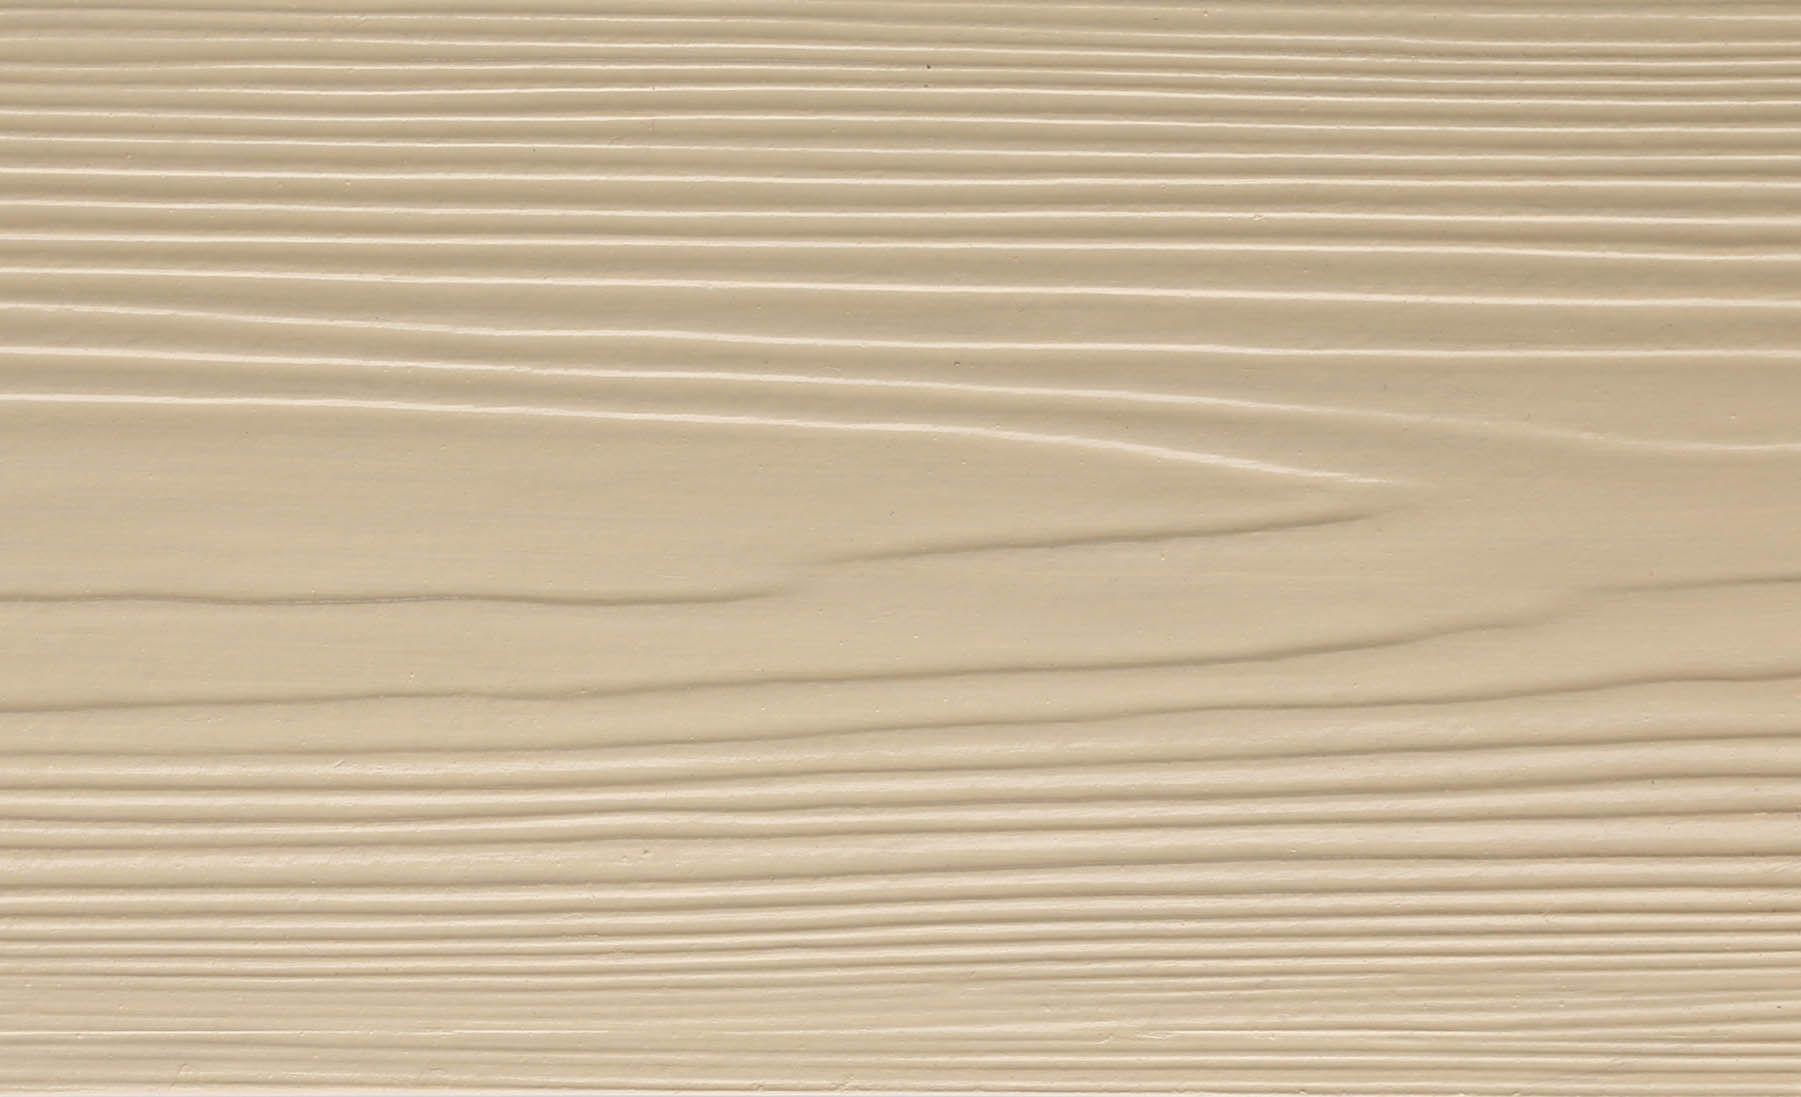 Wood Texture Fiber Cement Siding Sheet Wood Grain Cellulose Cement Cladding Panel Wood Like Over Lappin Cement Siding Cladding Panels Fiber Cement Siding